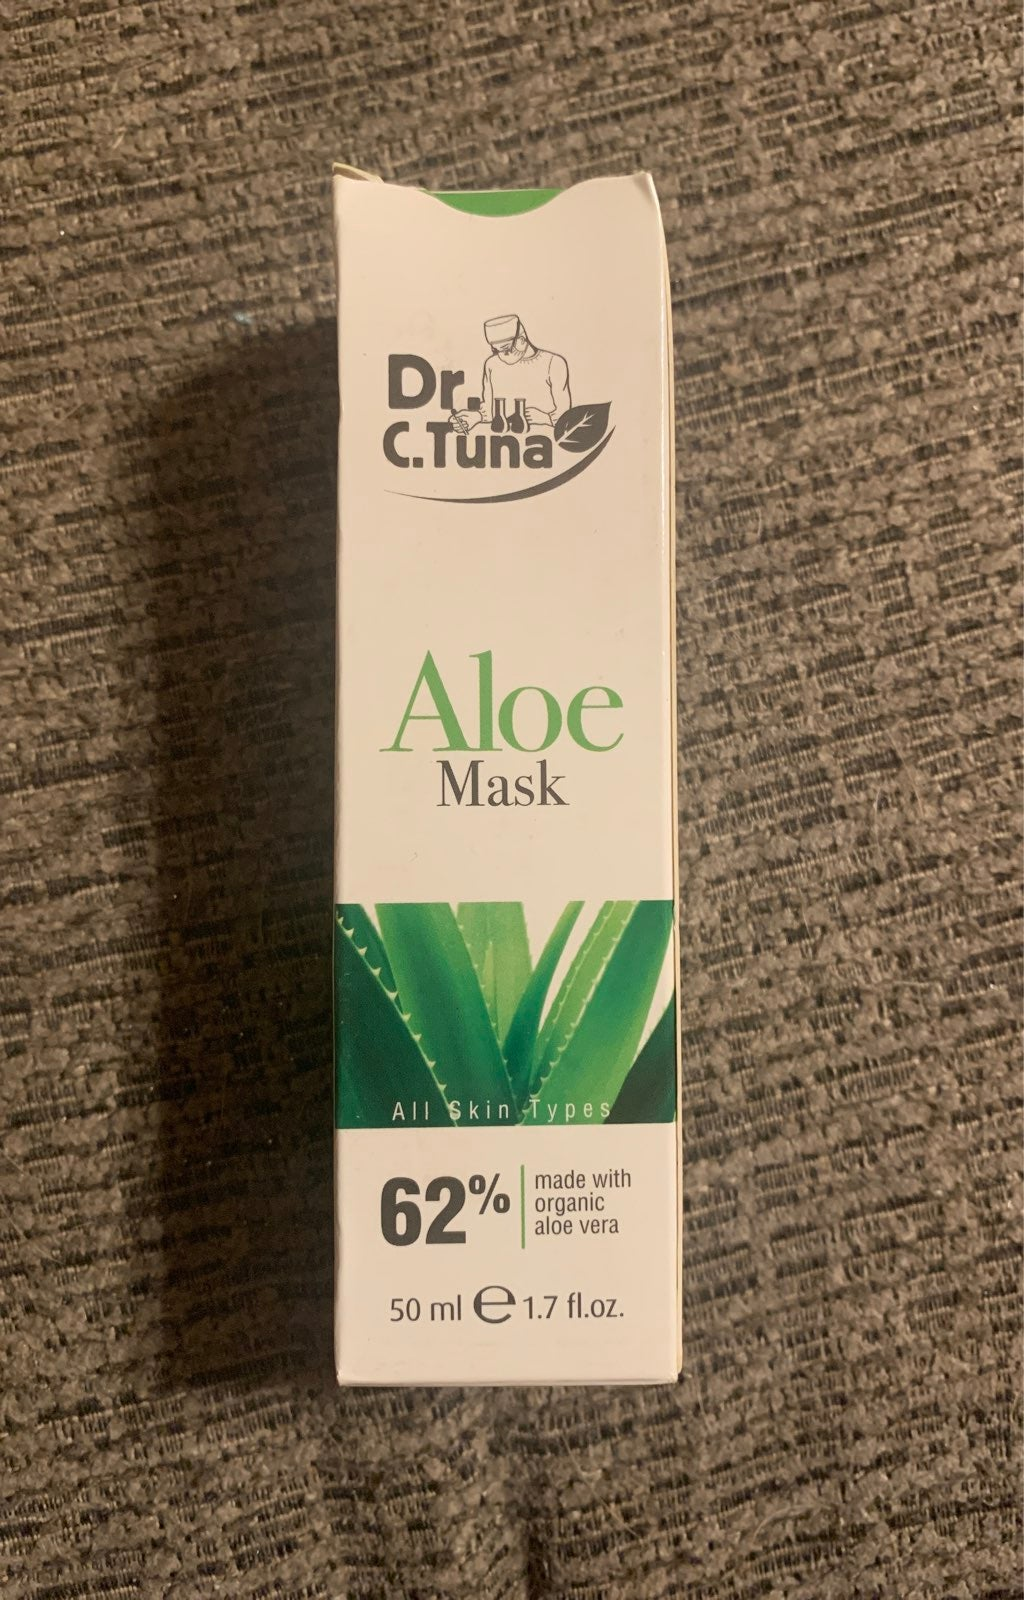 Dr C Tuna Aloe Mask